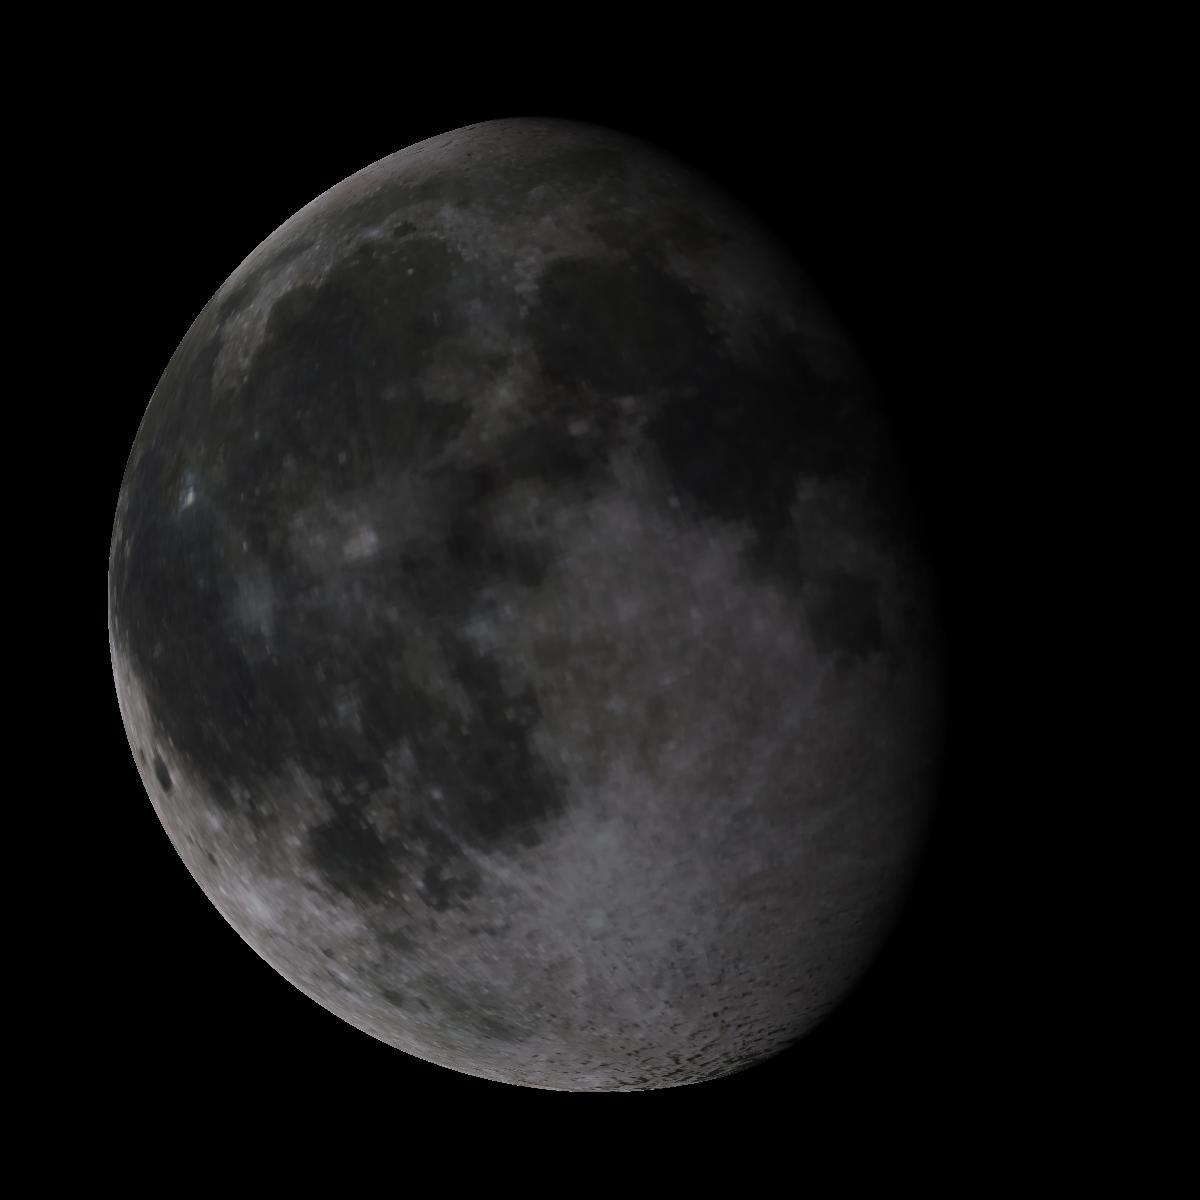 Lune du 13 mars 2020